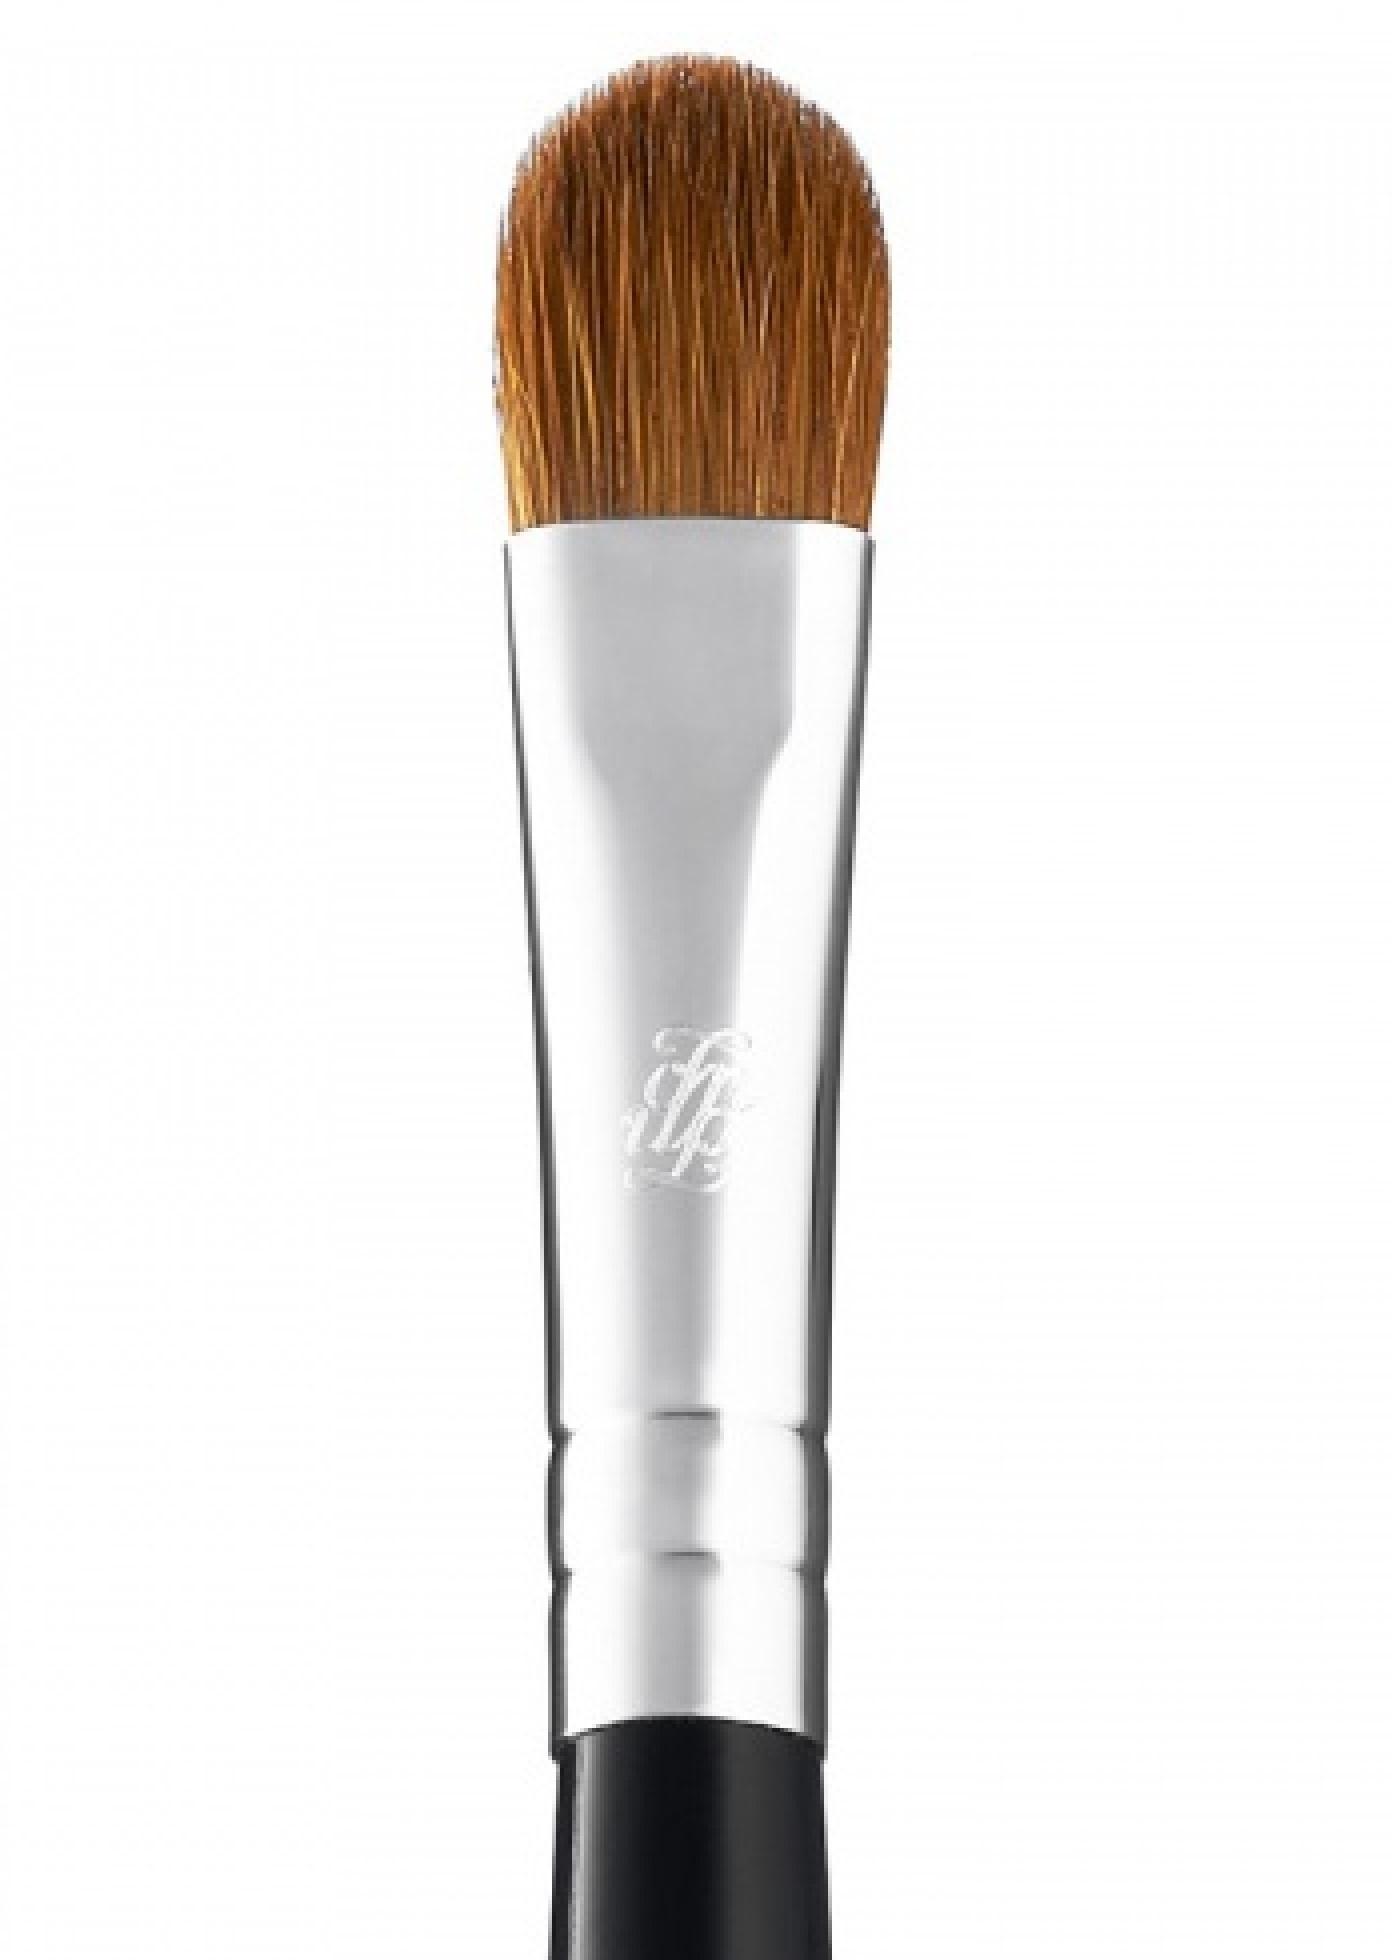 Кисть для нанесения теней B151 make up secret eyeshadow refill 153 цвет 153 variant hex name f1505c